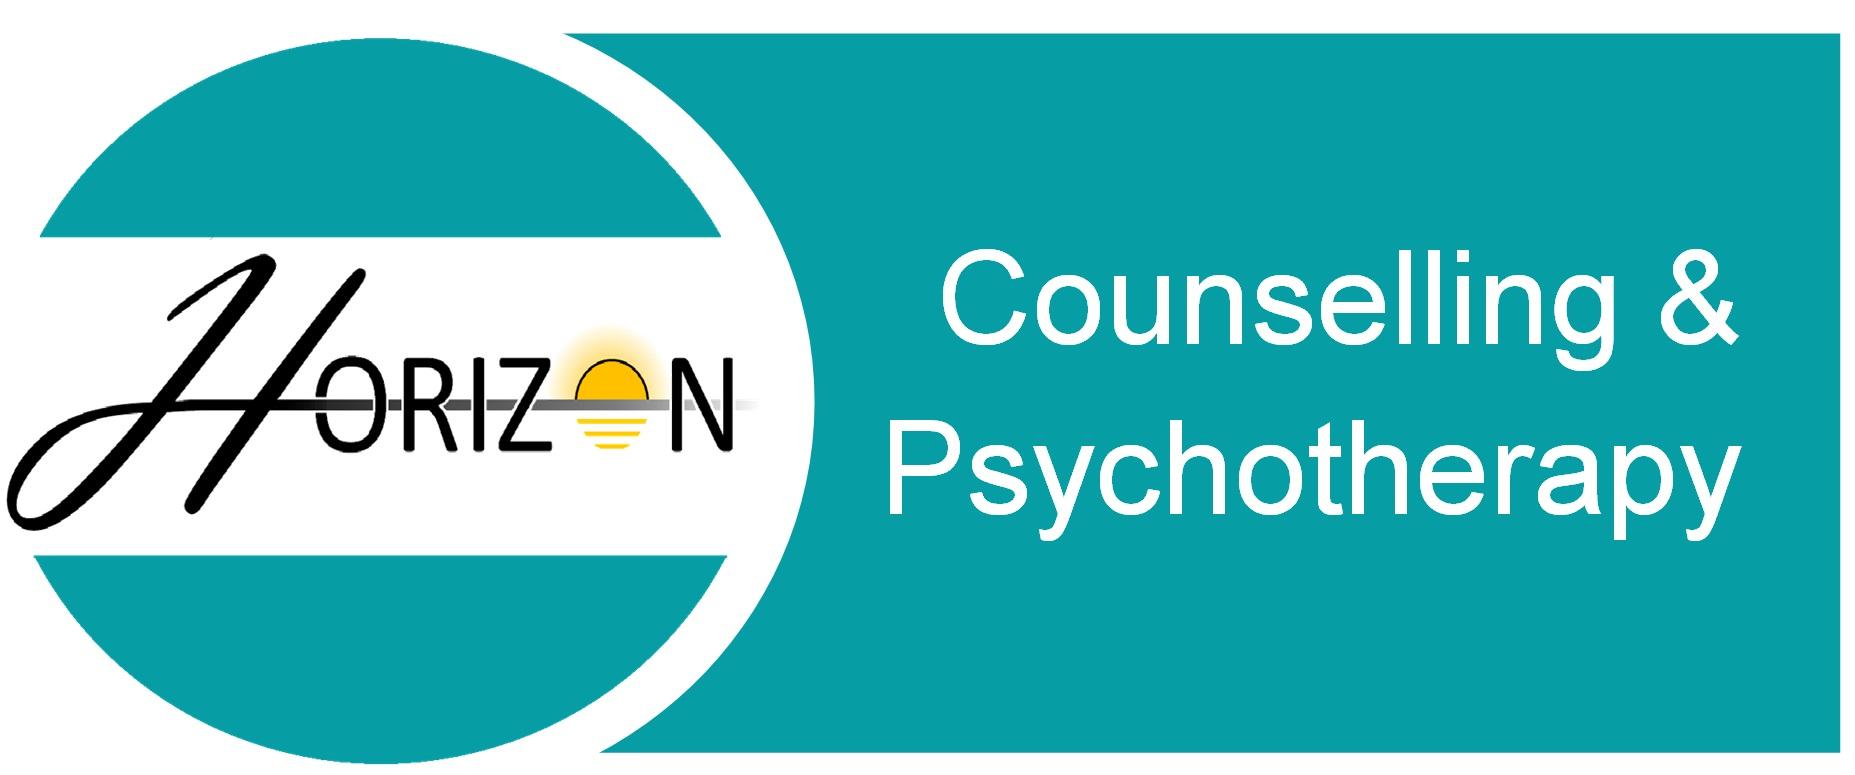 Horizon Counselling & Psychotherapy